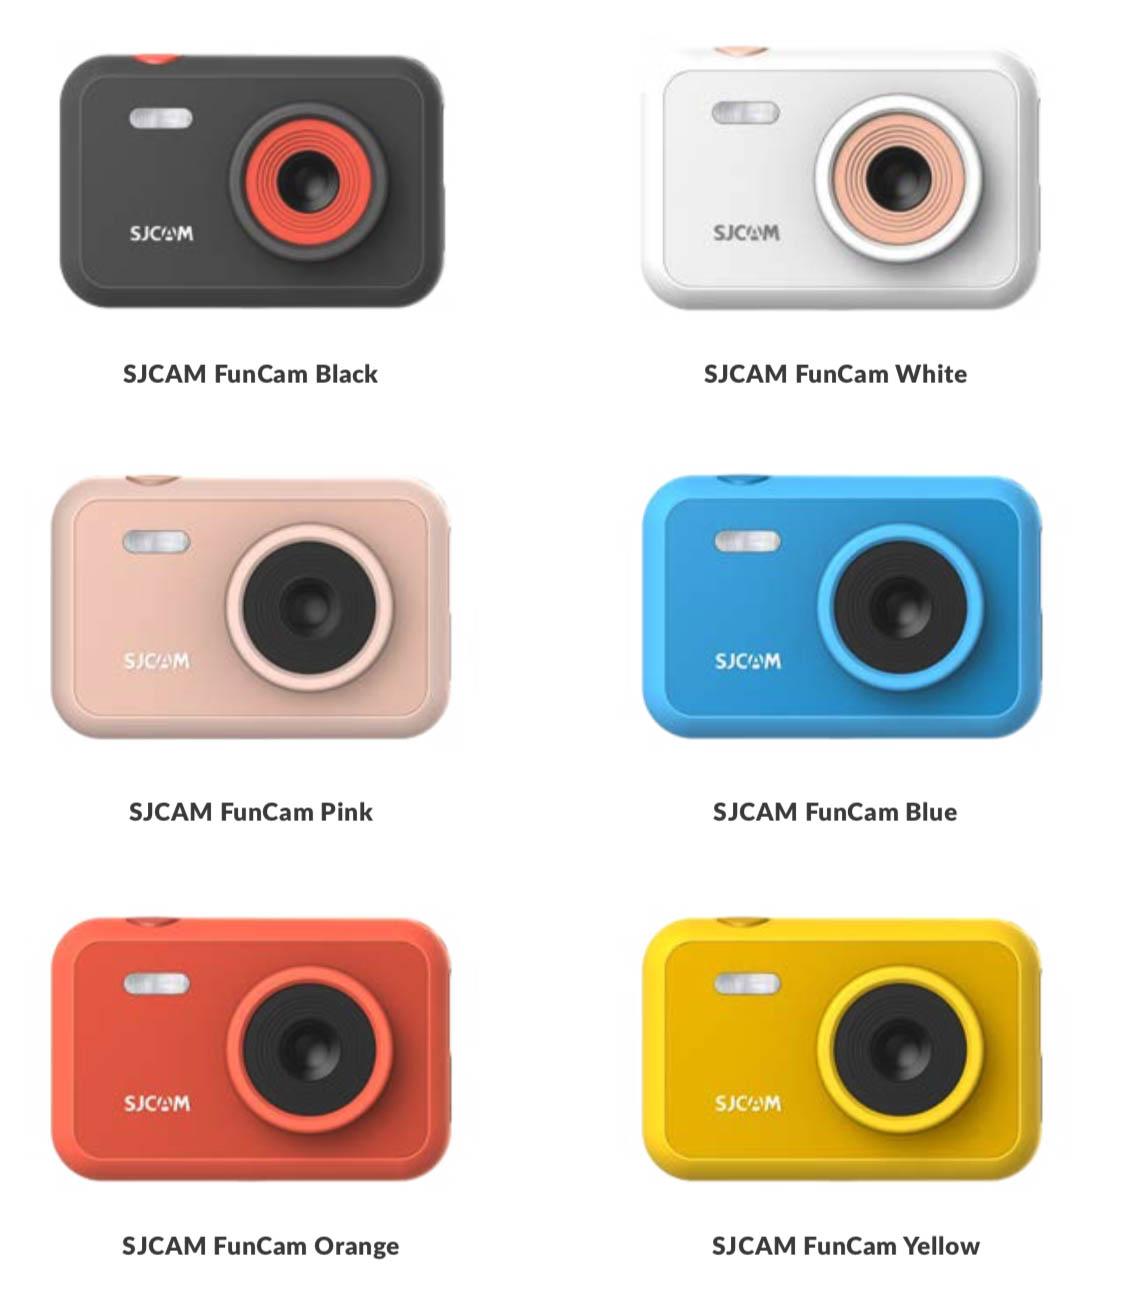 funcam-kids-hd-camera-features-7.jpg